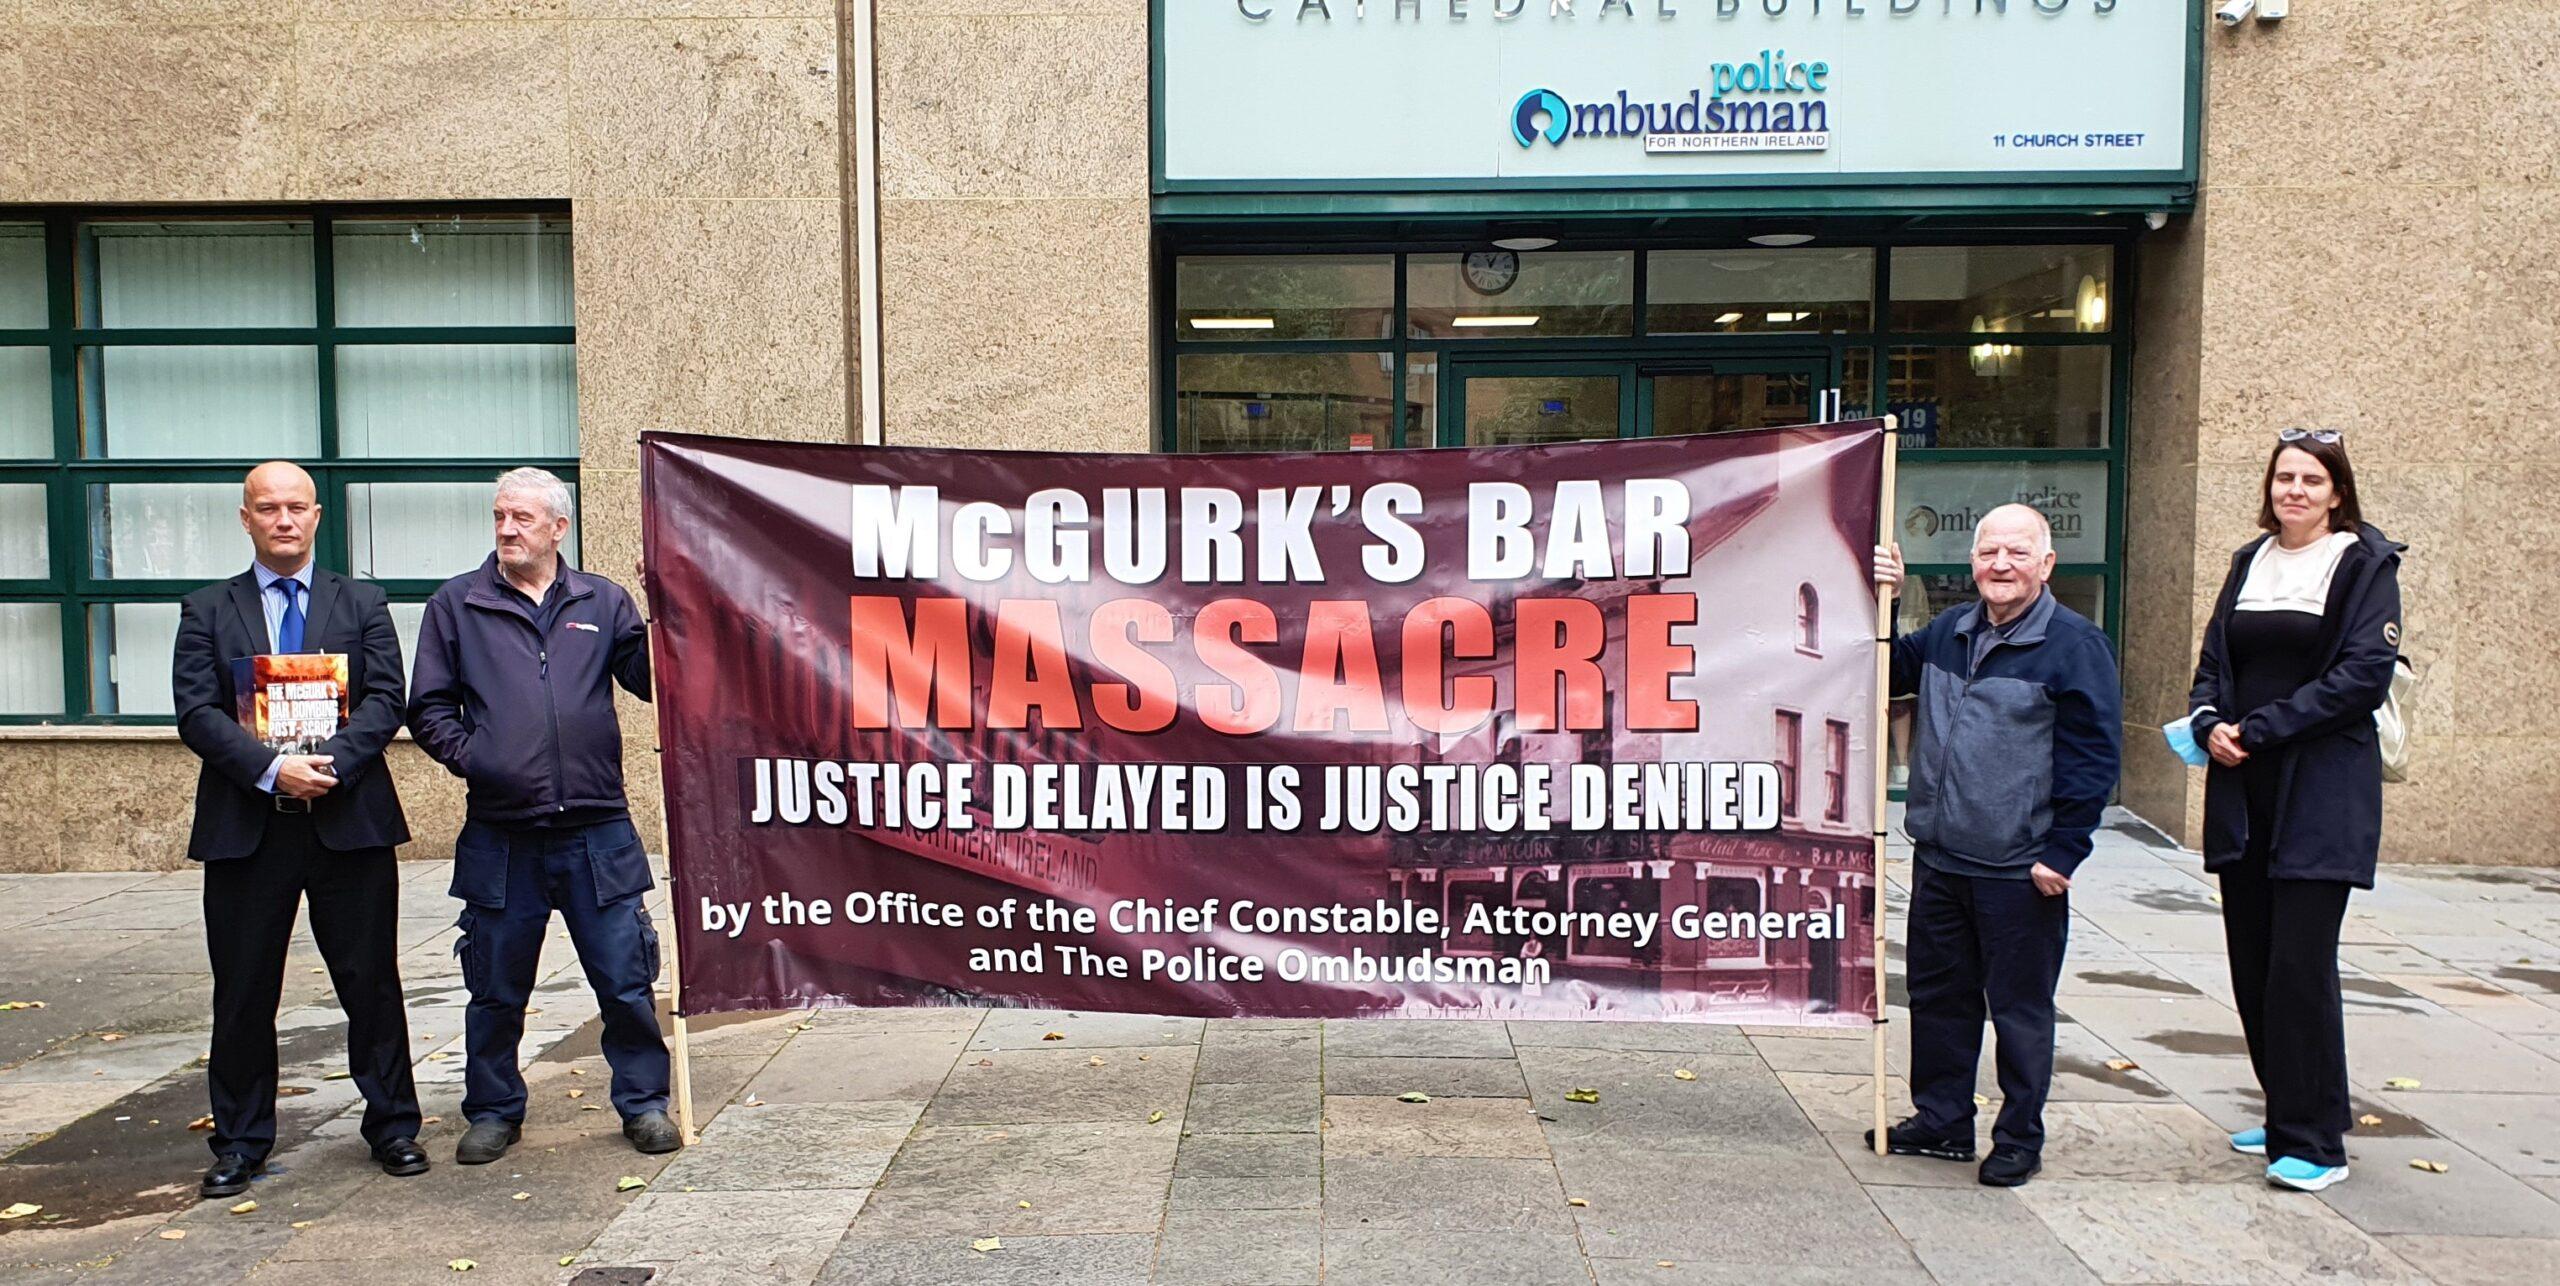 McGurk's Bar Protest v Office of the Police Ombudsman